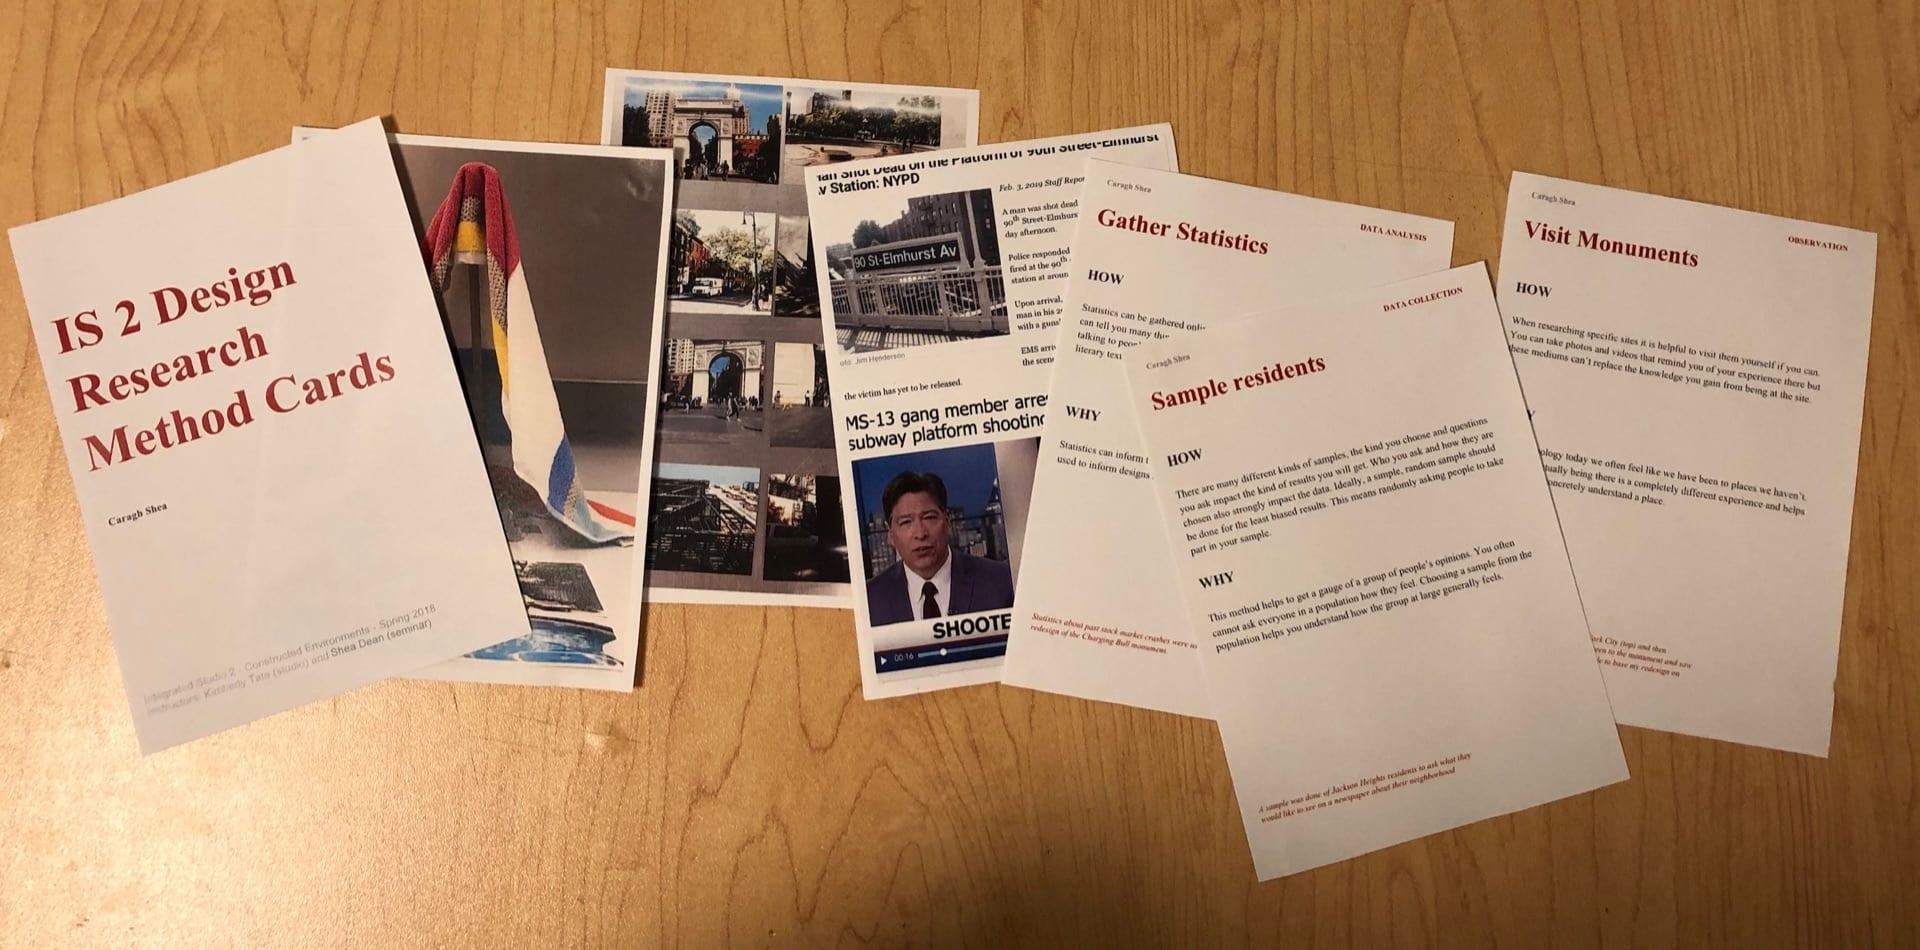 Bridge 1: Research Method Cards